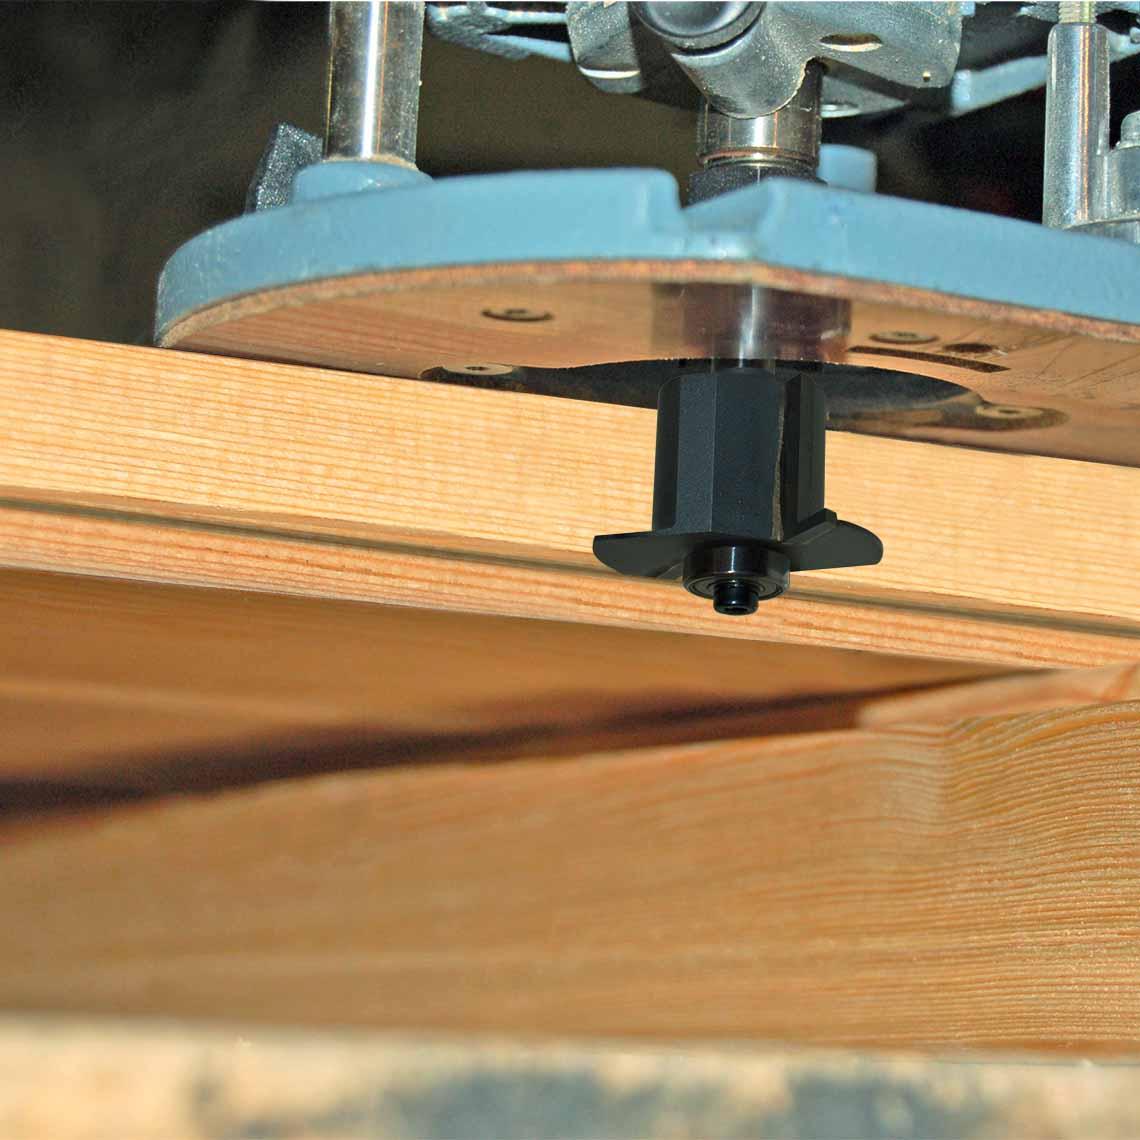 Z-deck fasteners